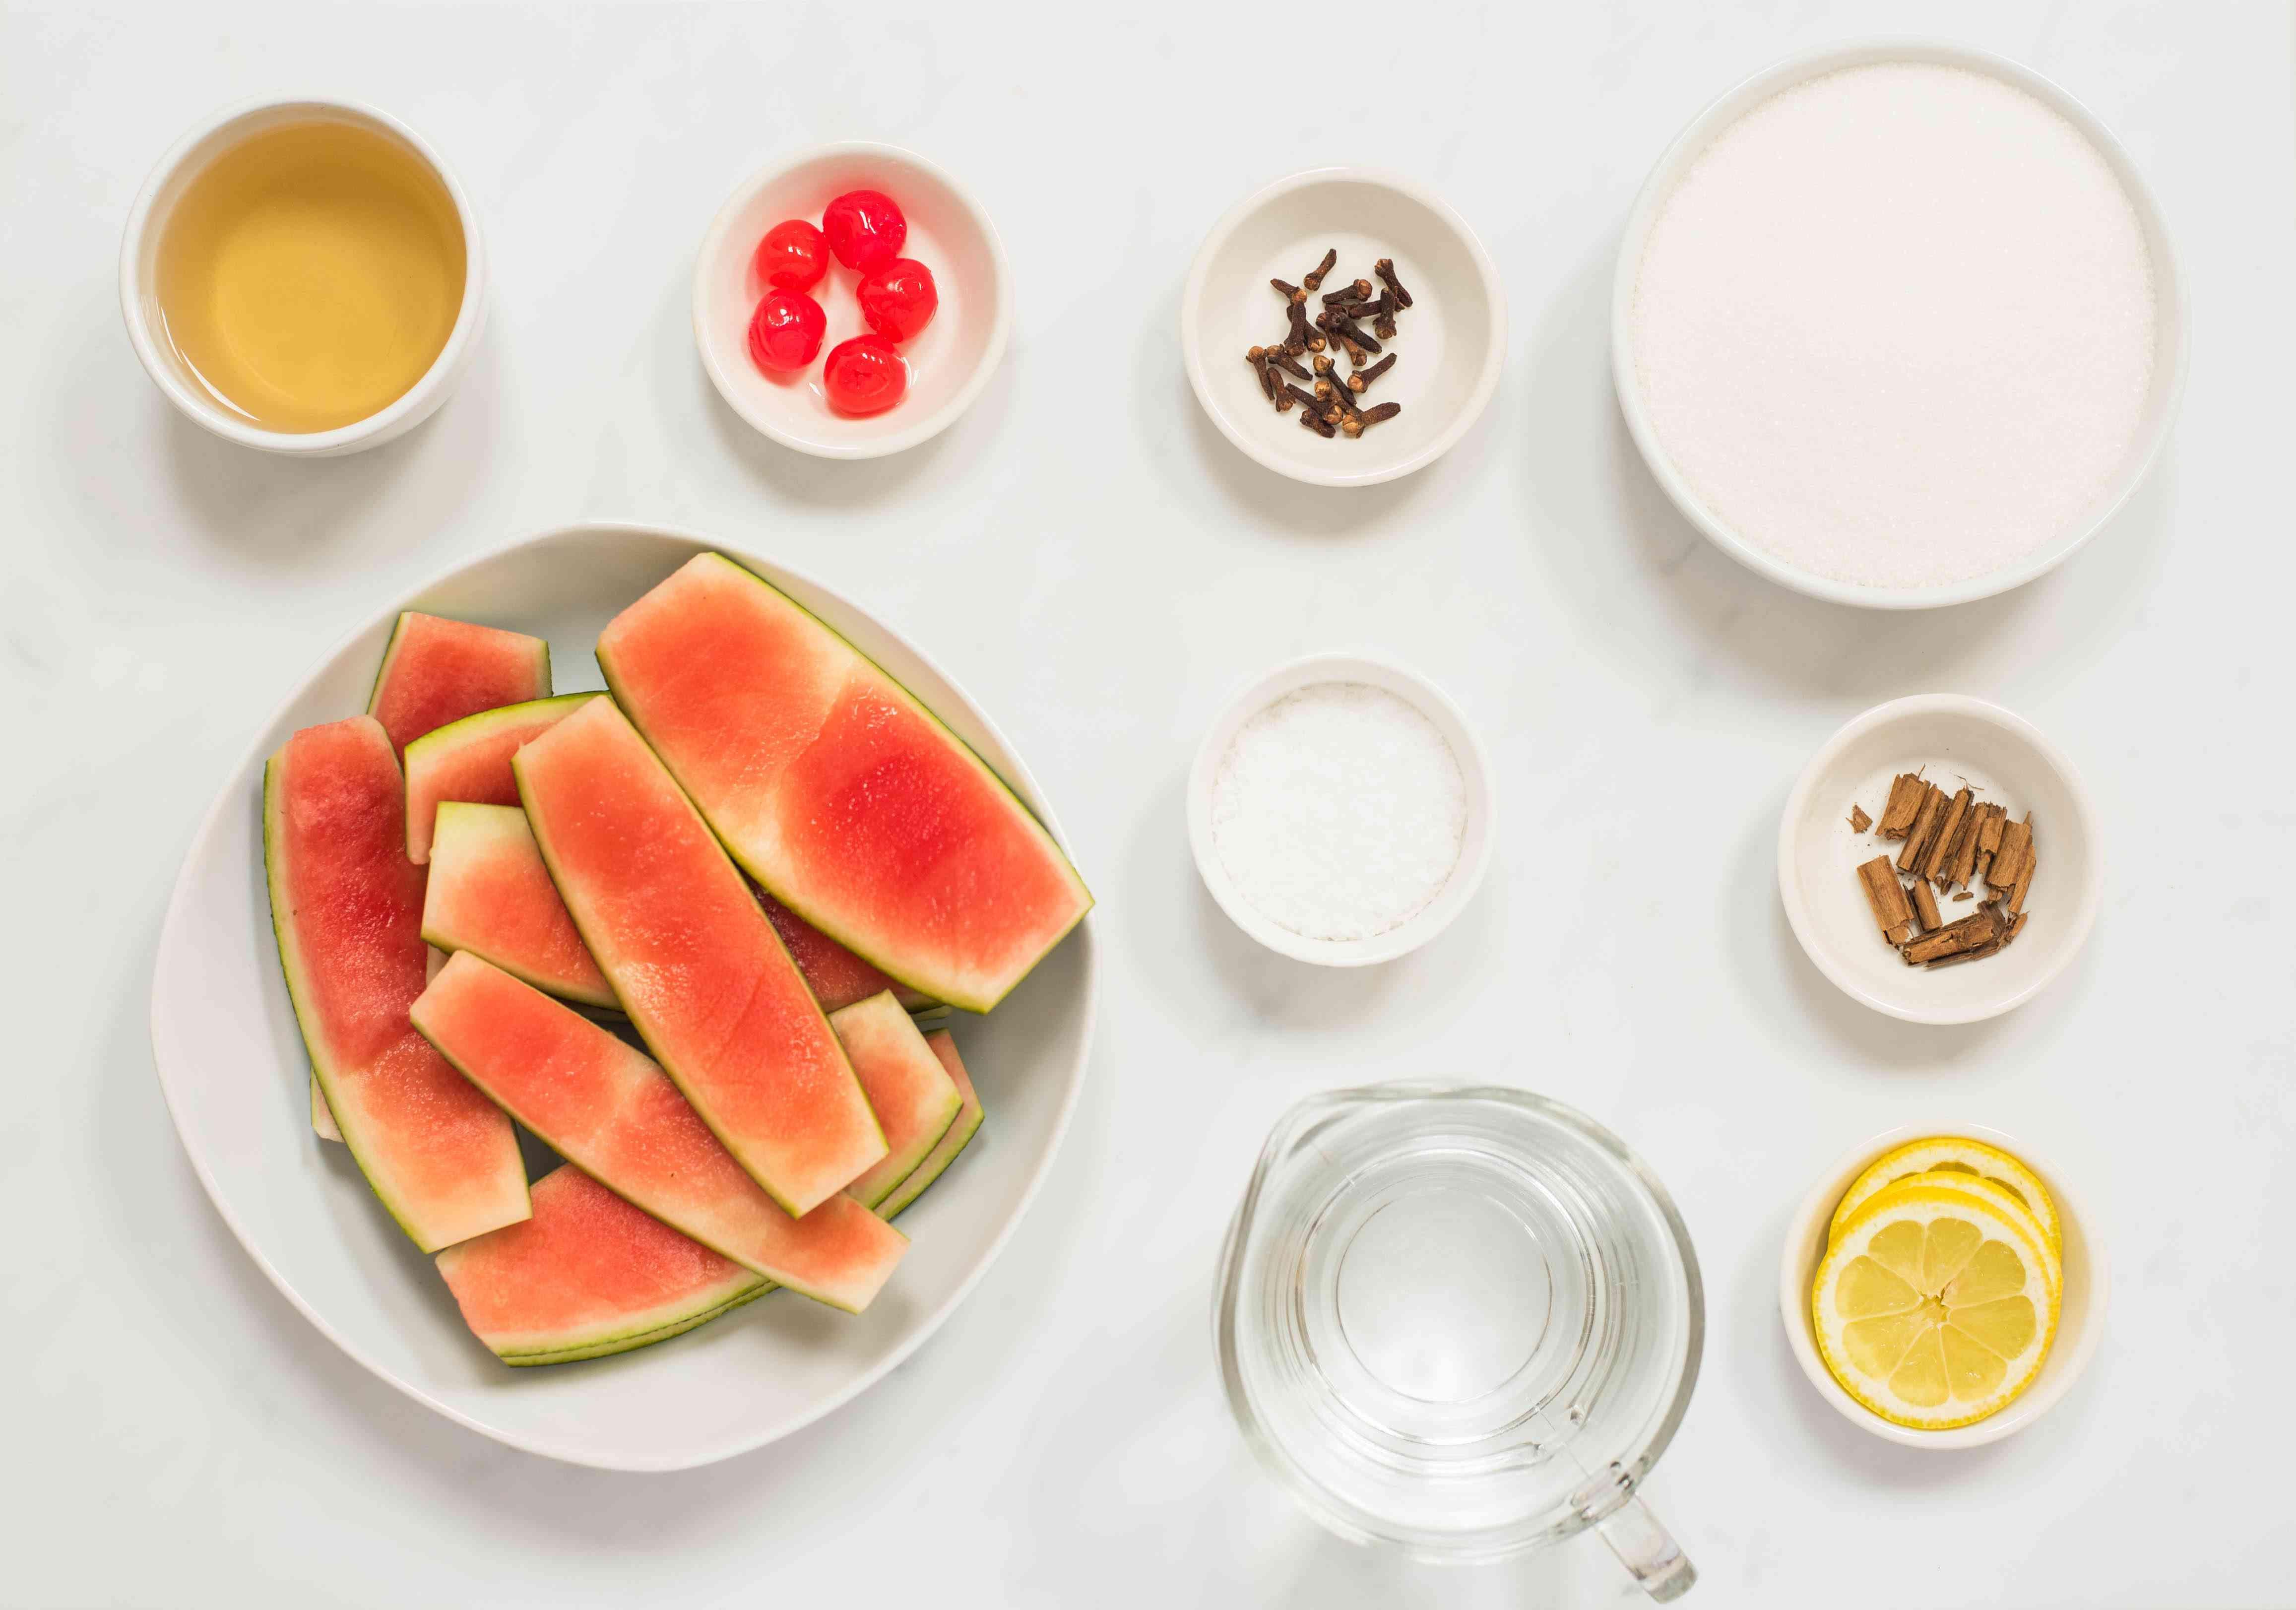 Ingredients for watermelon rind pickles